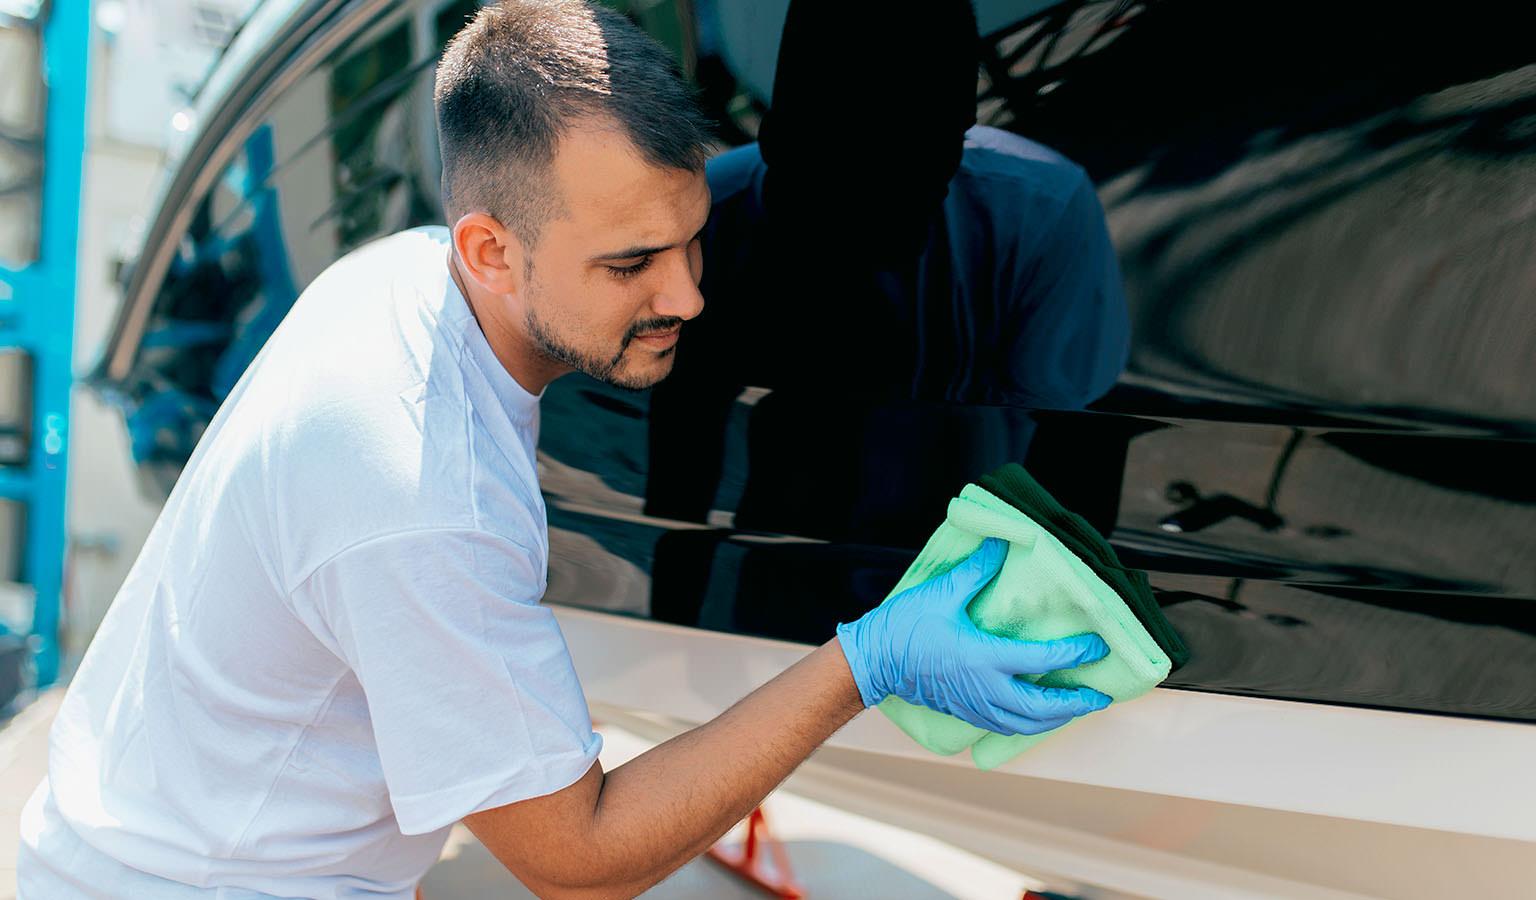 Save up to 35% on Fiberglass & Gelcoat Repair